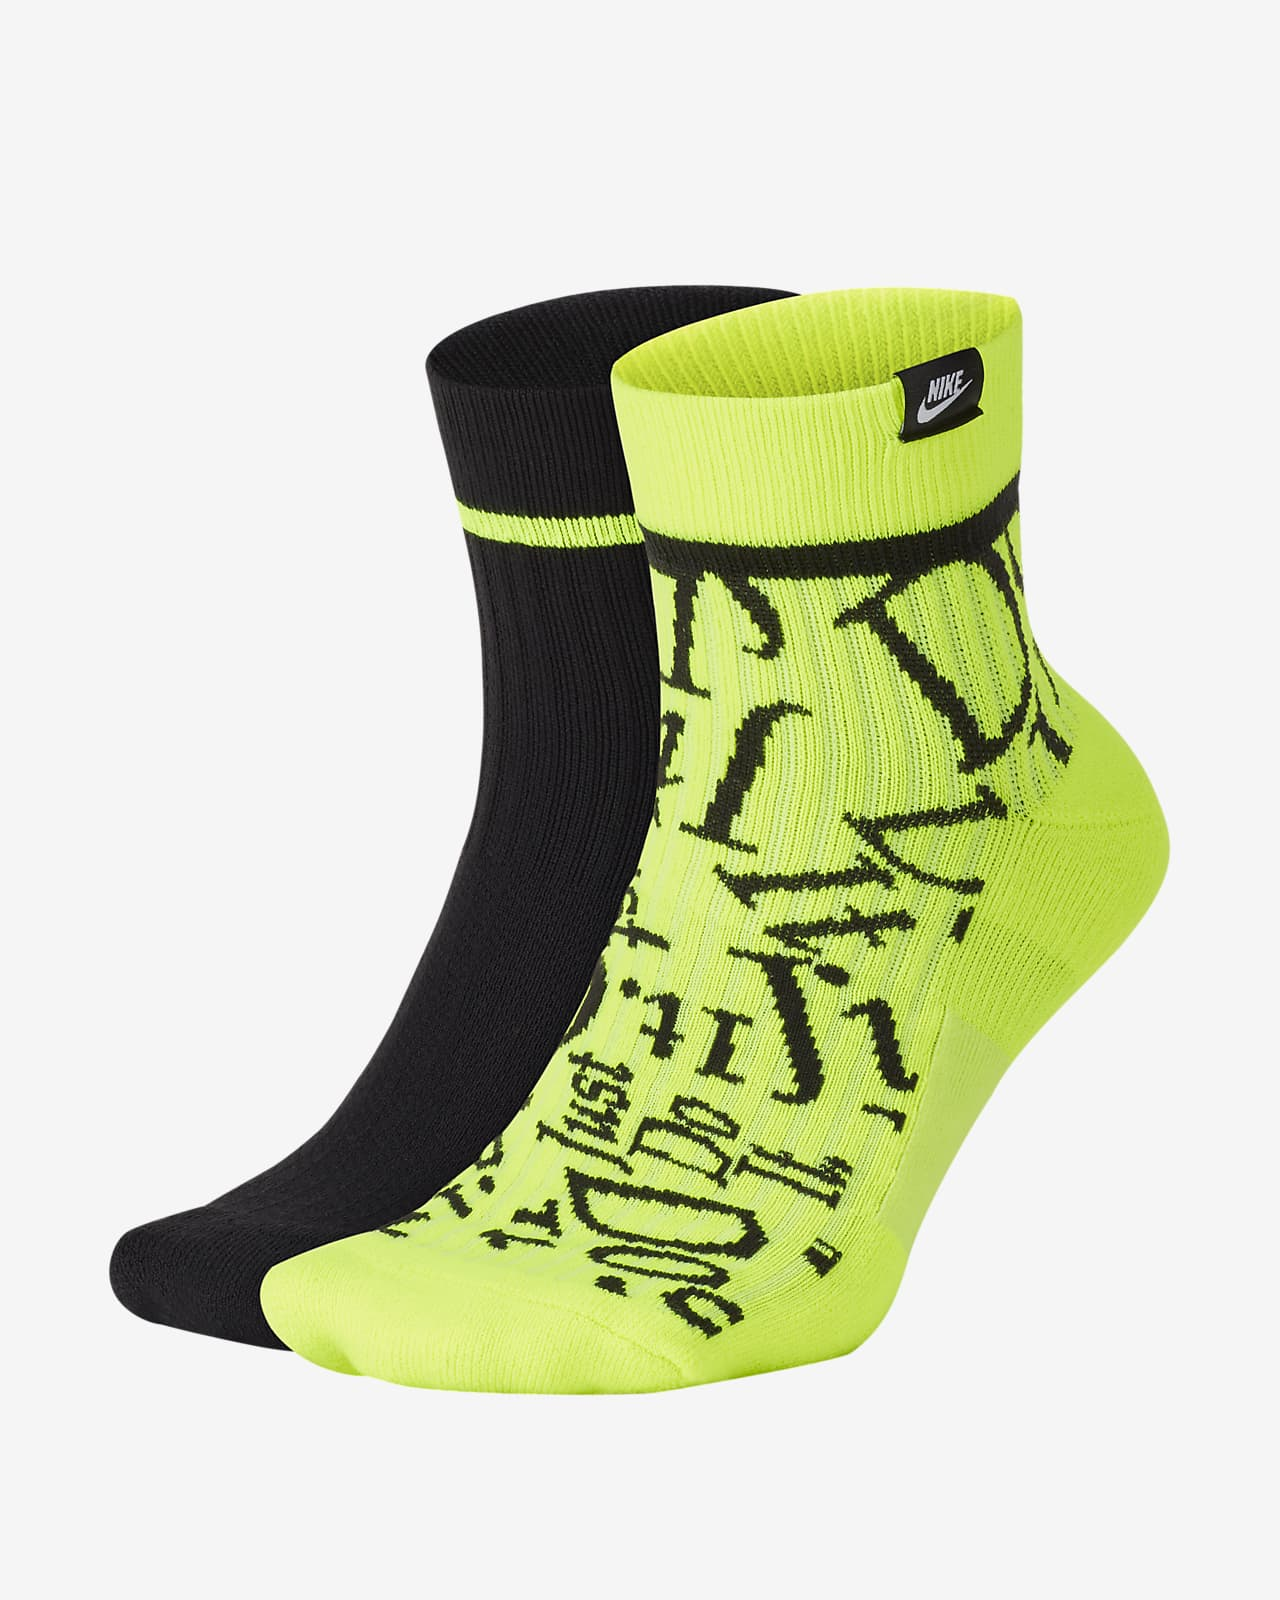 Nike SNEAKR Sox JDI Ankle Socks (2 Pairs)